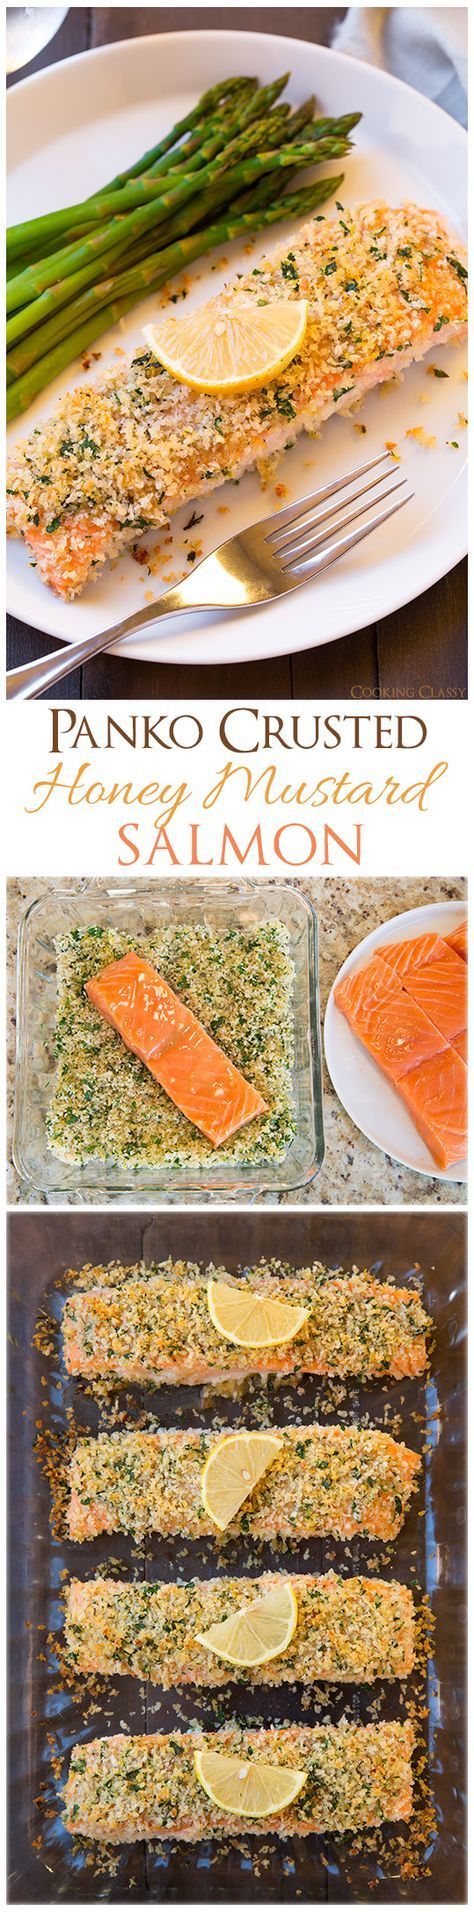 Panko Crusted Honey Mustard Salmon